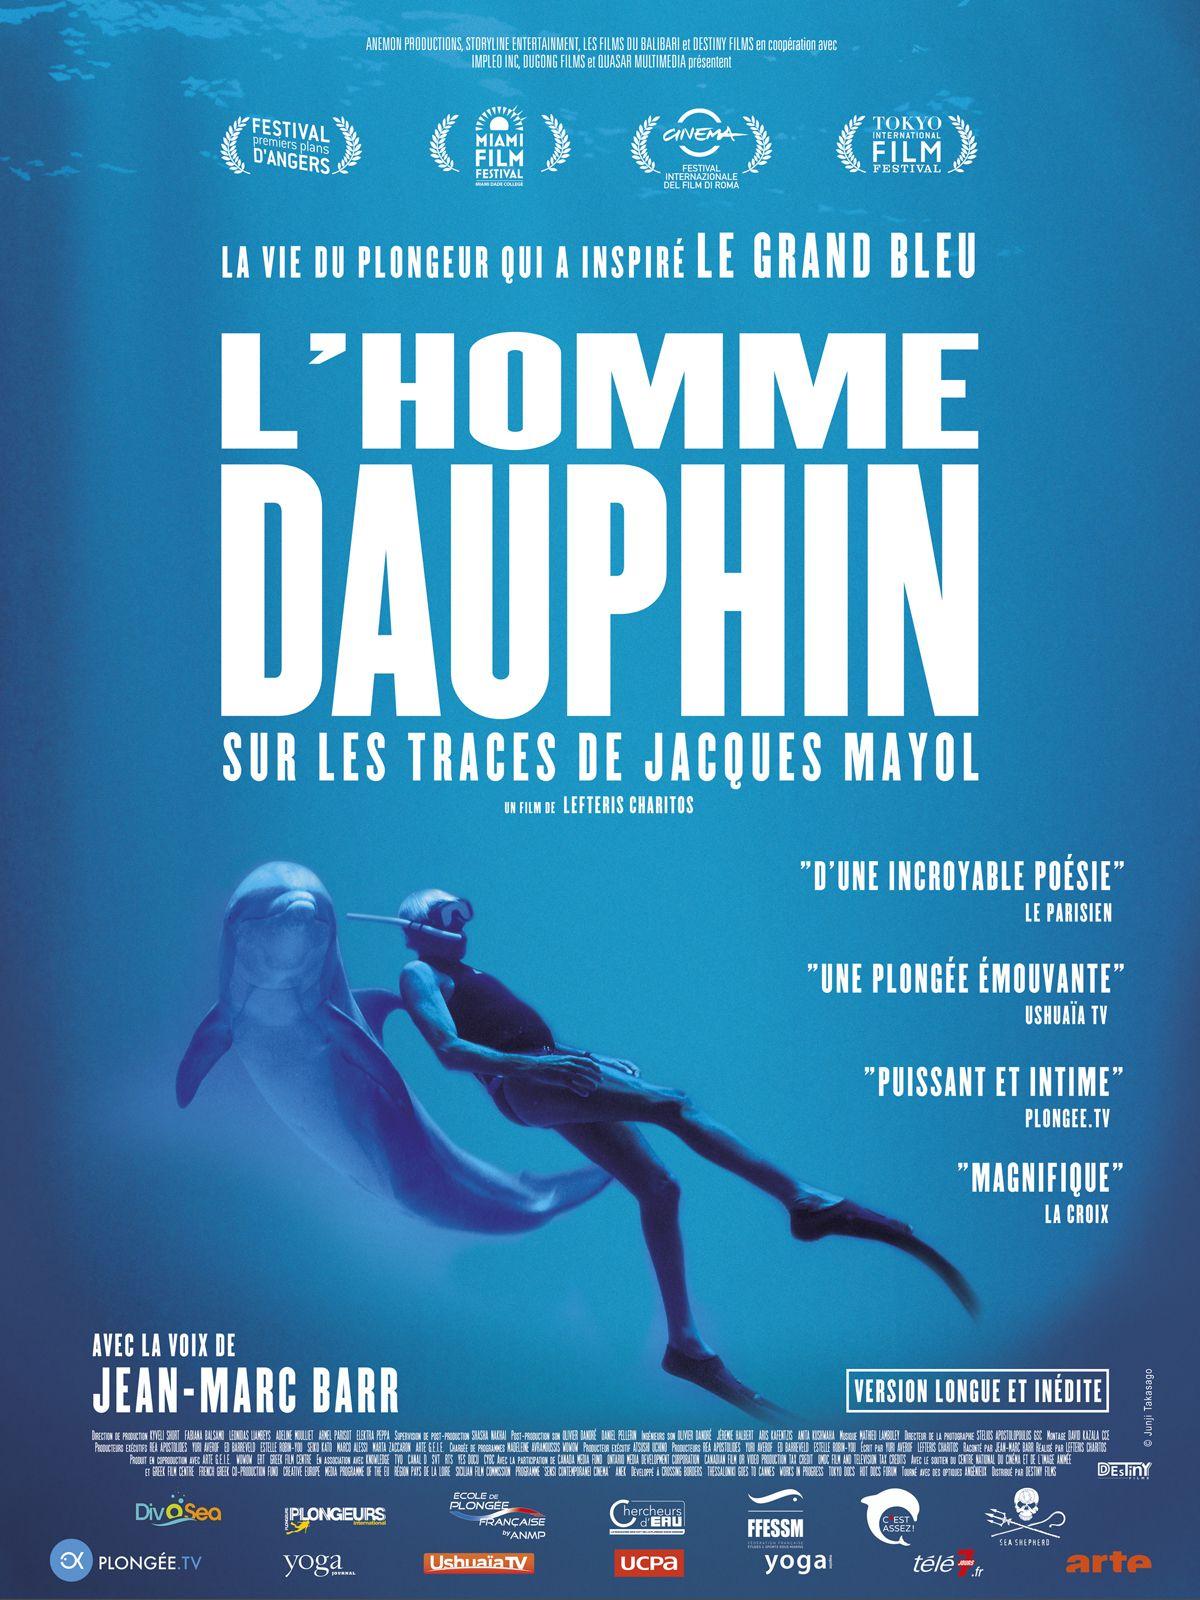 L'Homme dauphin, sur les traces de Jacques Mayol (2018) Dolphin Man - Lefteris Charitos - 720p HDTV - French